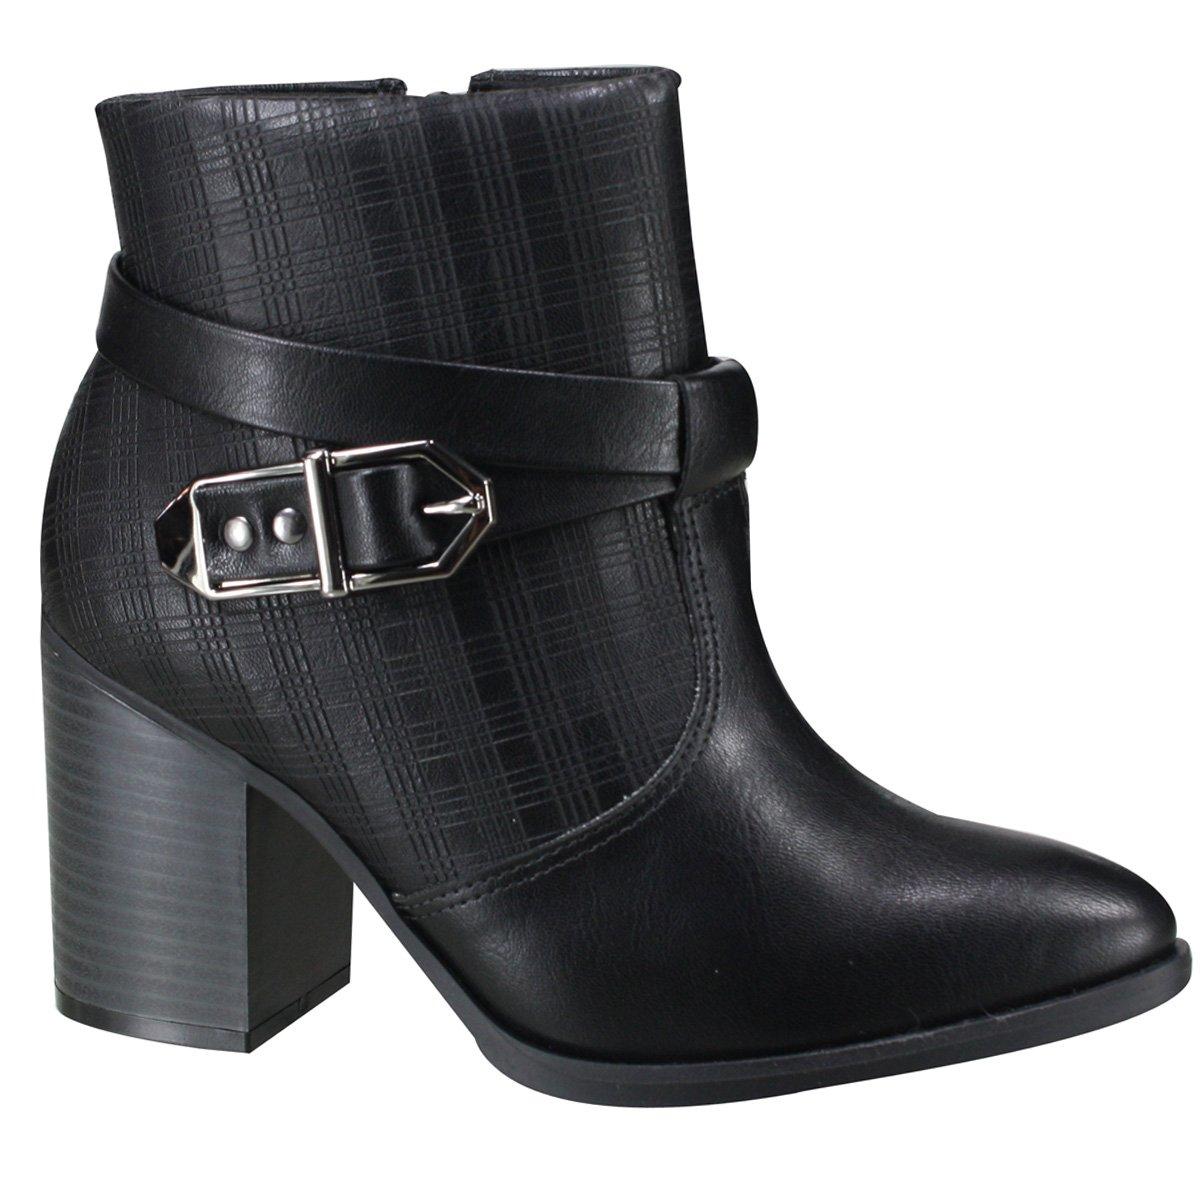 8920ca289 Bota Ankle Boot Ramarim Feminina 19-16101 000003 - Preto (Vegetal ...